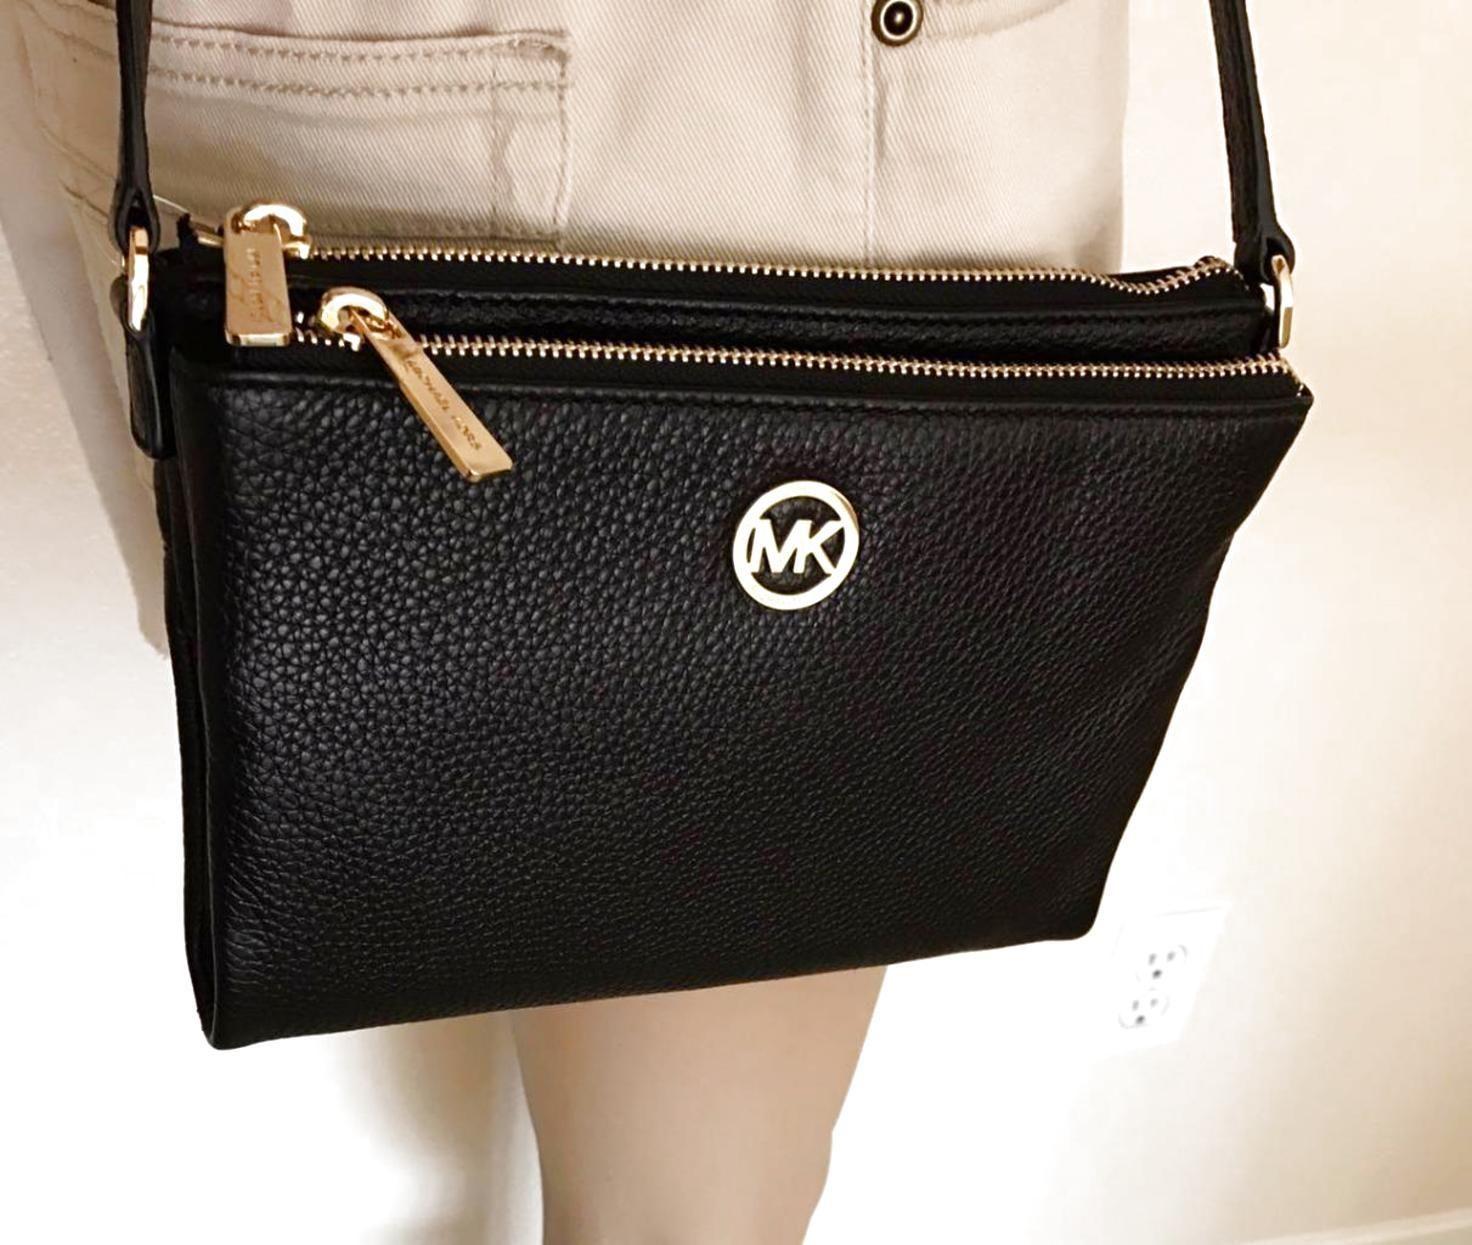 046440f0c2e7 NWT Michael Kors Fulton Black Leather Large Crossbody Bag Handbag  122.0